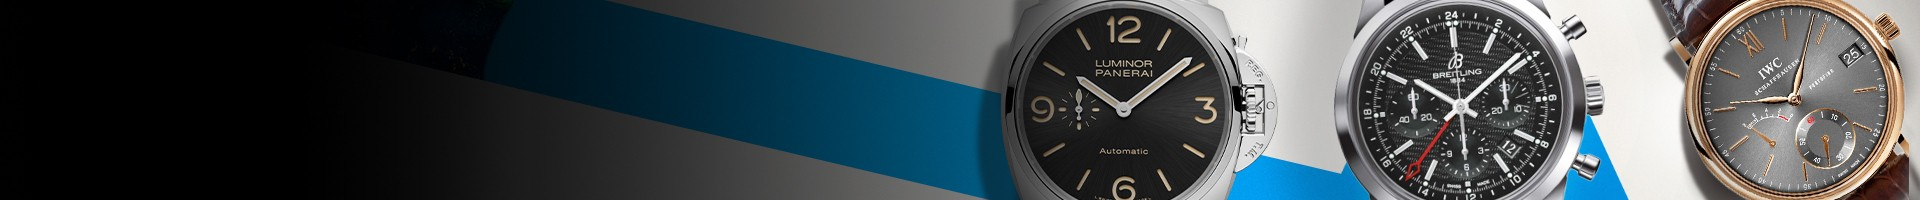 Great Watch Deals